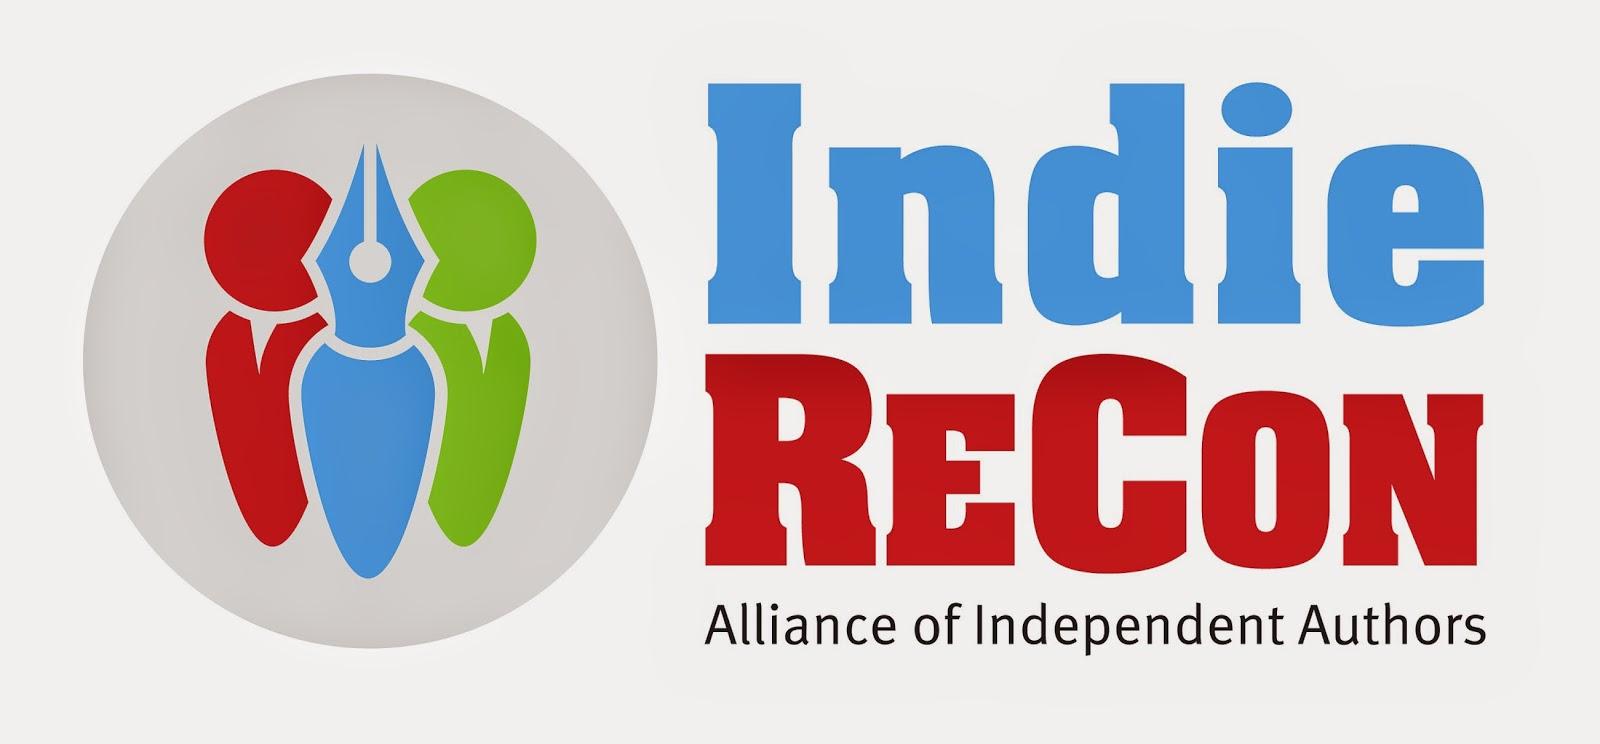 #indierecon第1天,www.bawama.com